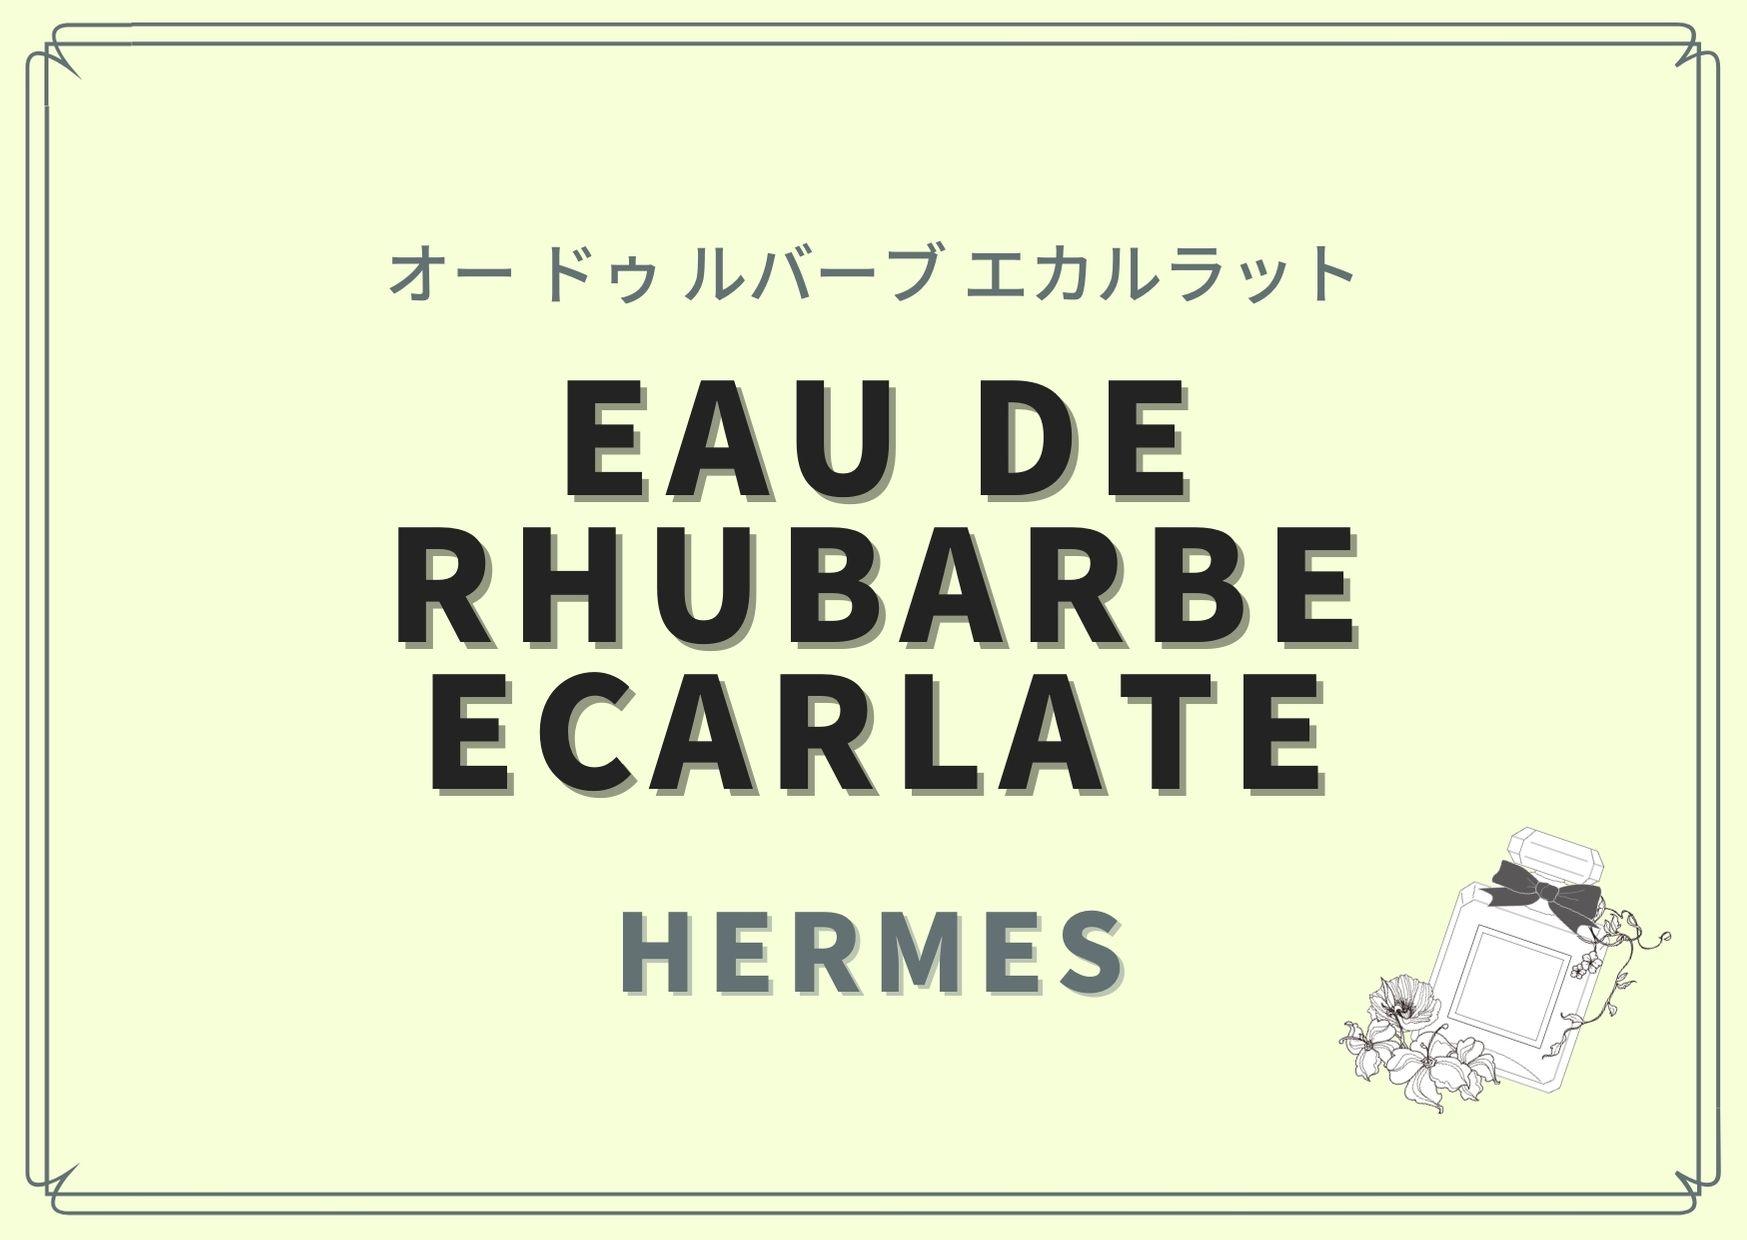 Eau de Rhubarbe Ecarlate(オー ドゥ ルバーブ エカルラット)/HERMES(エルメス)